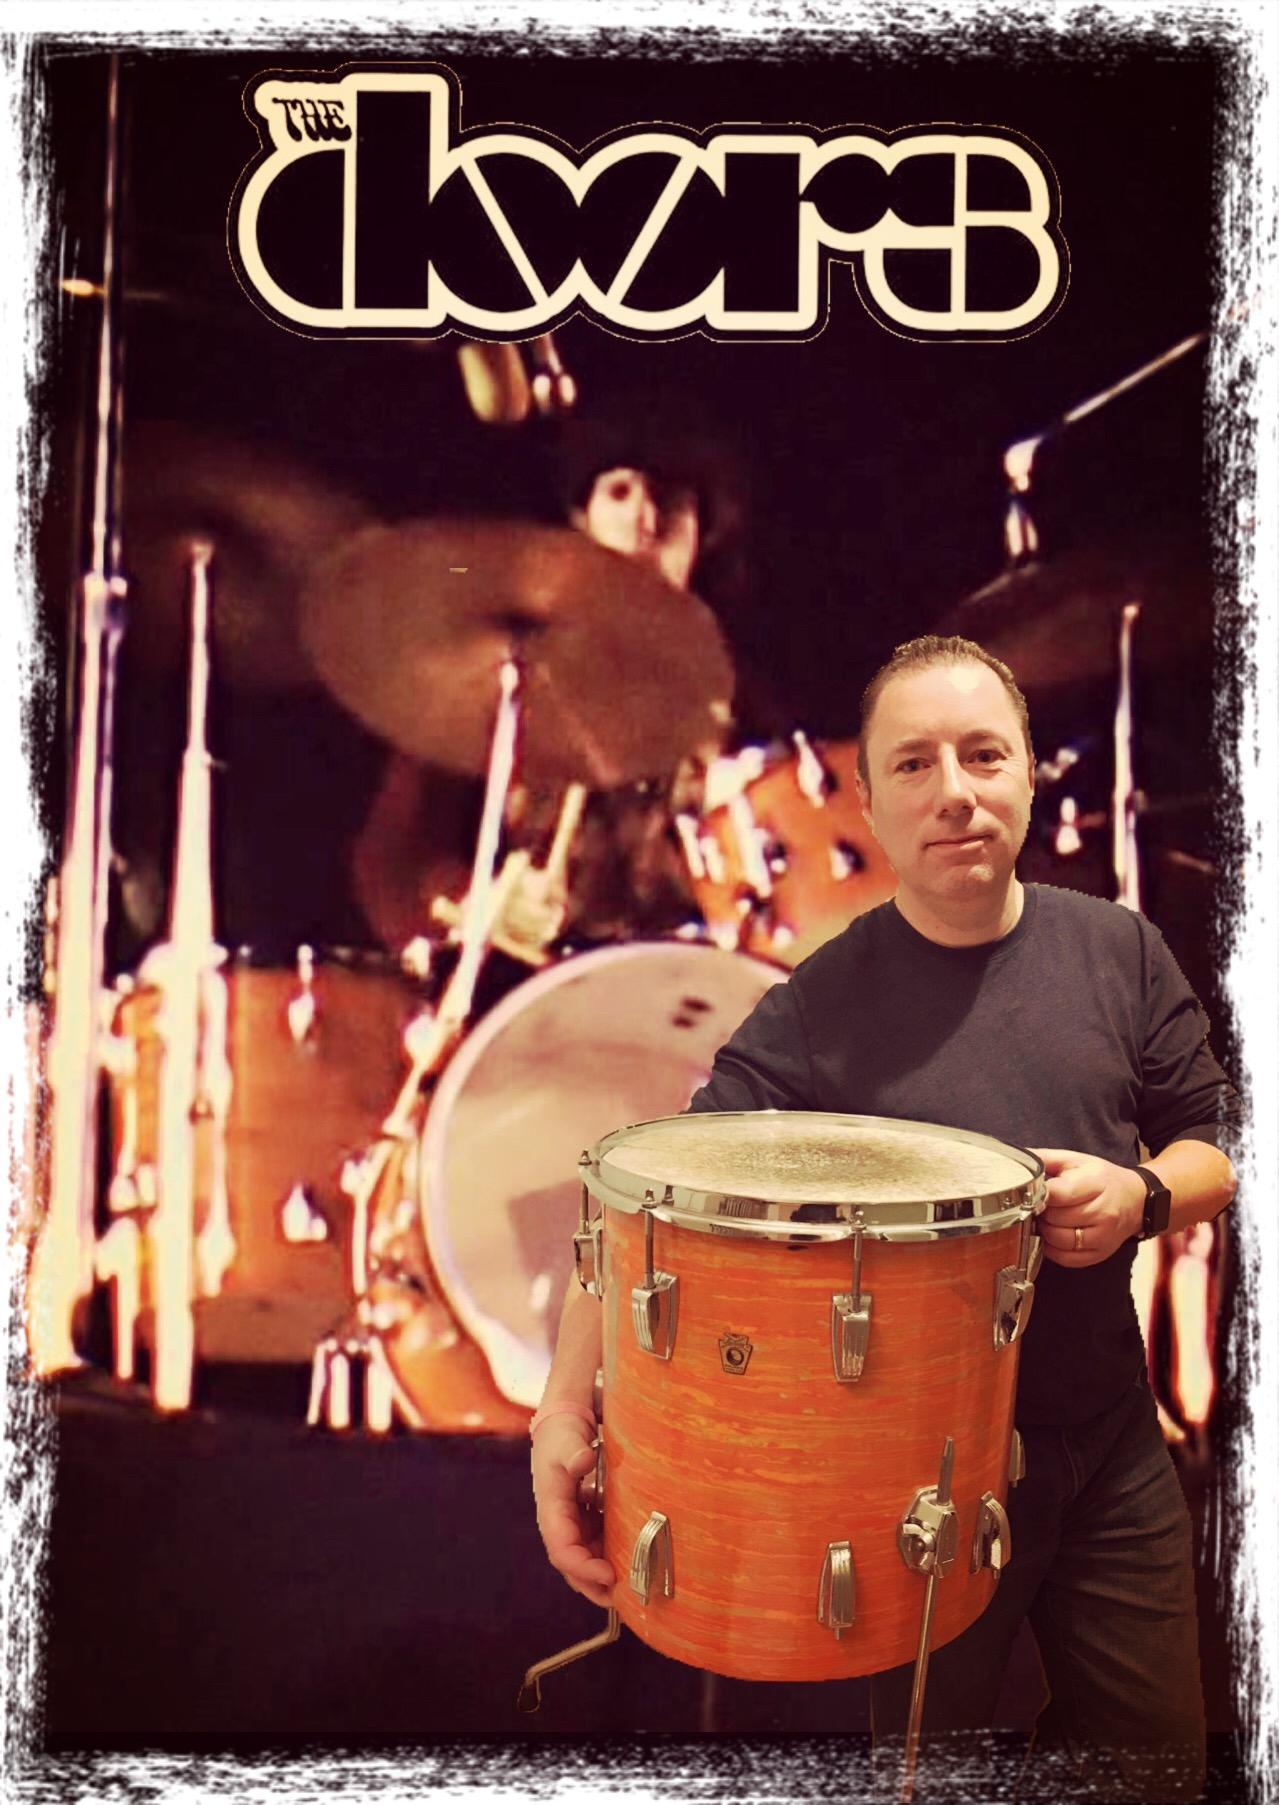 Mod Real Drum : Densmore's, Ludwig, Orange, Doors, Modern, Drummer